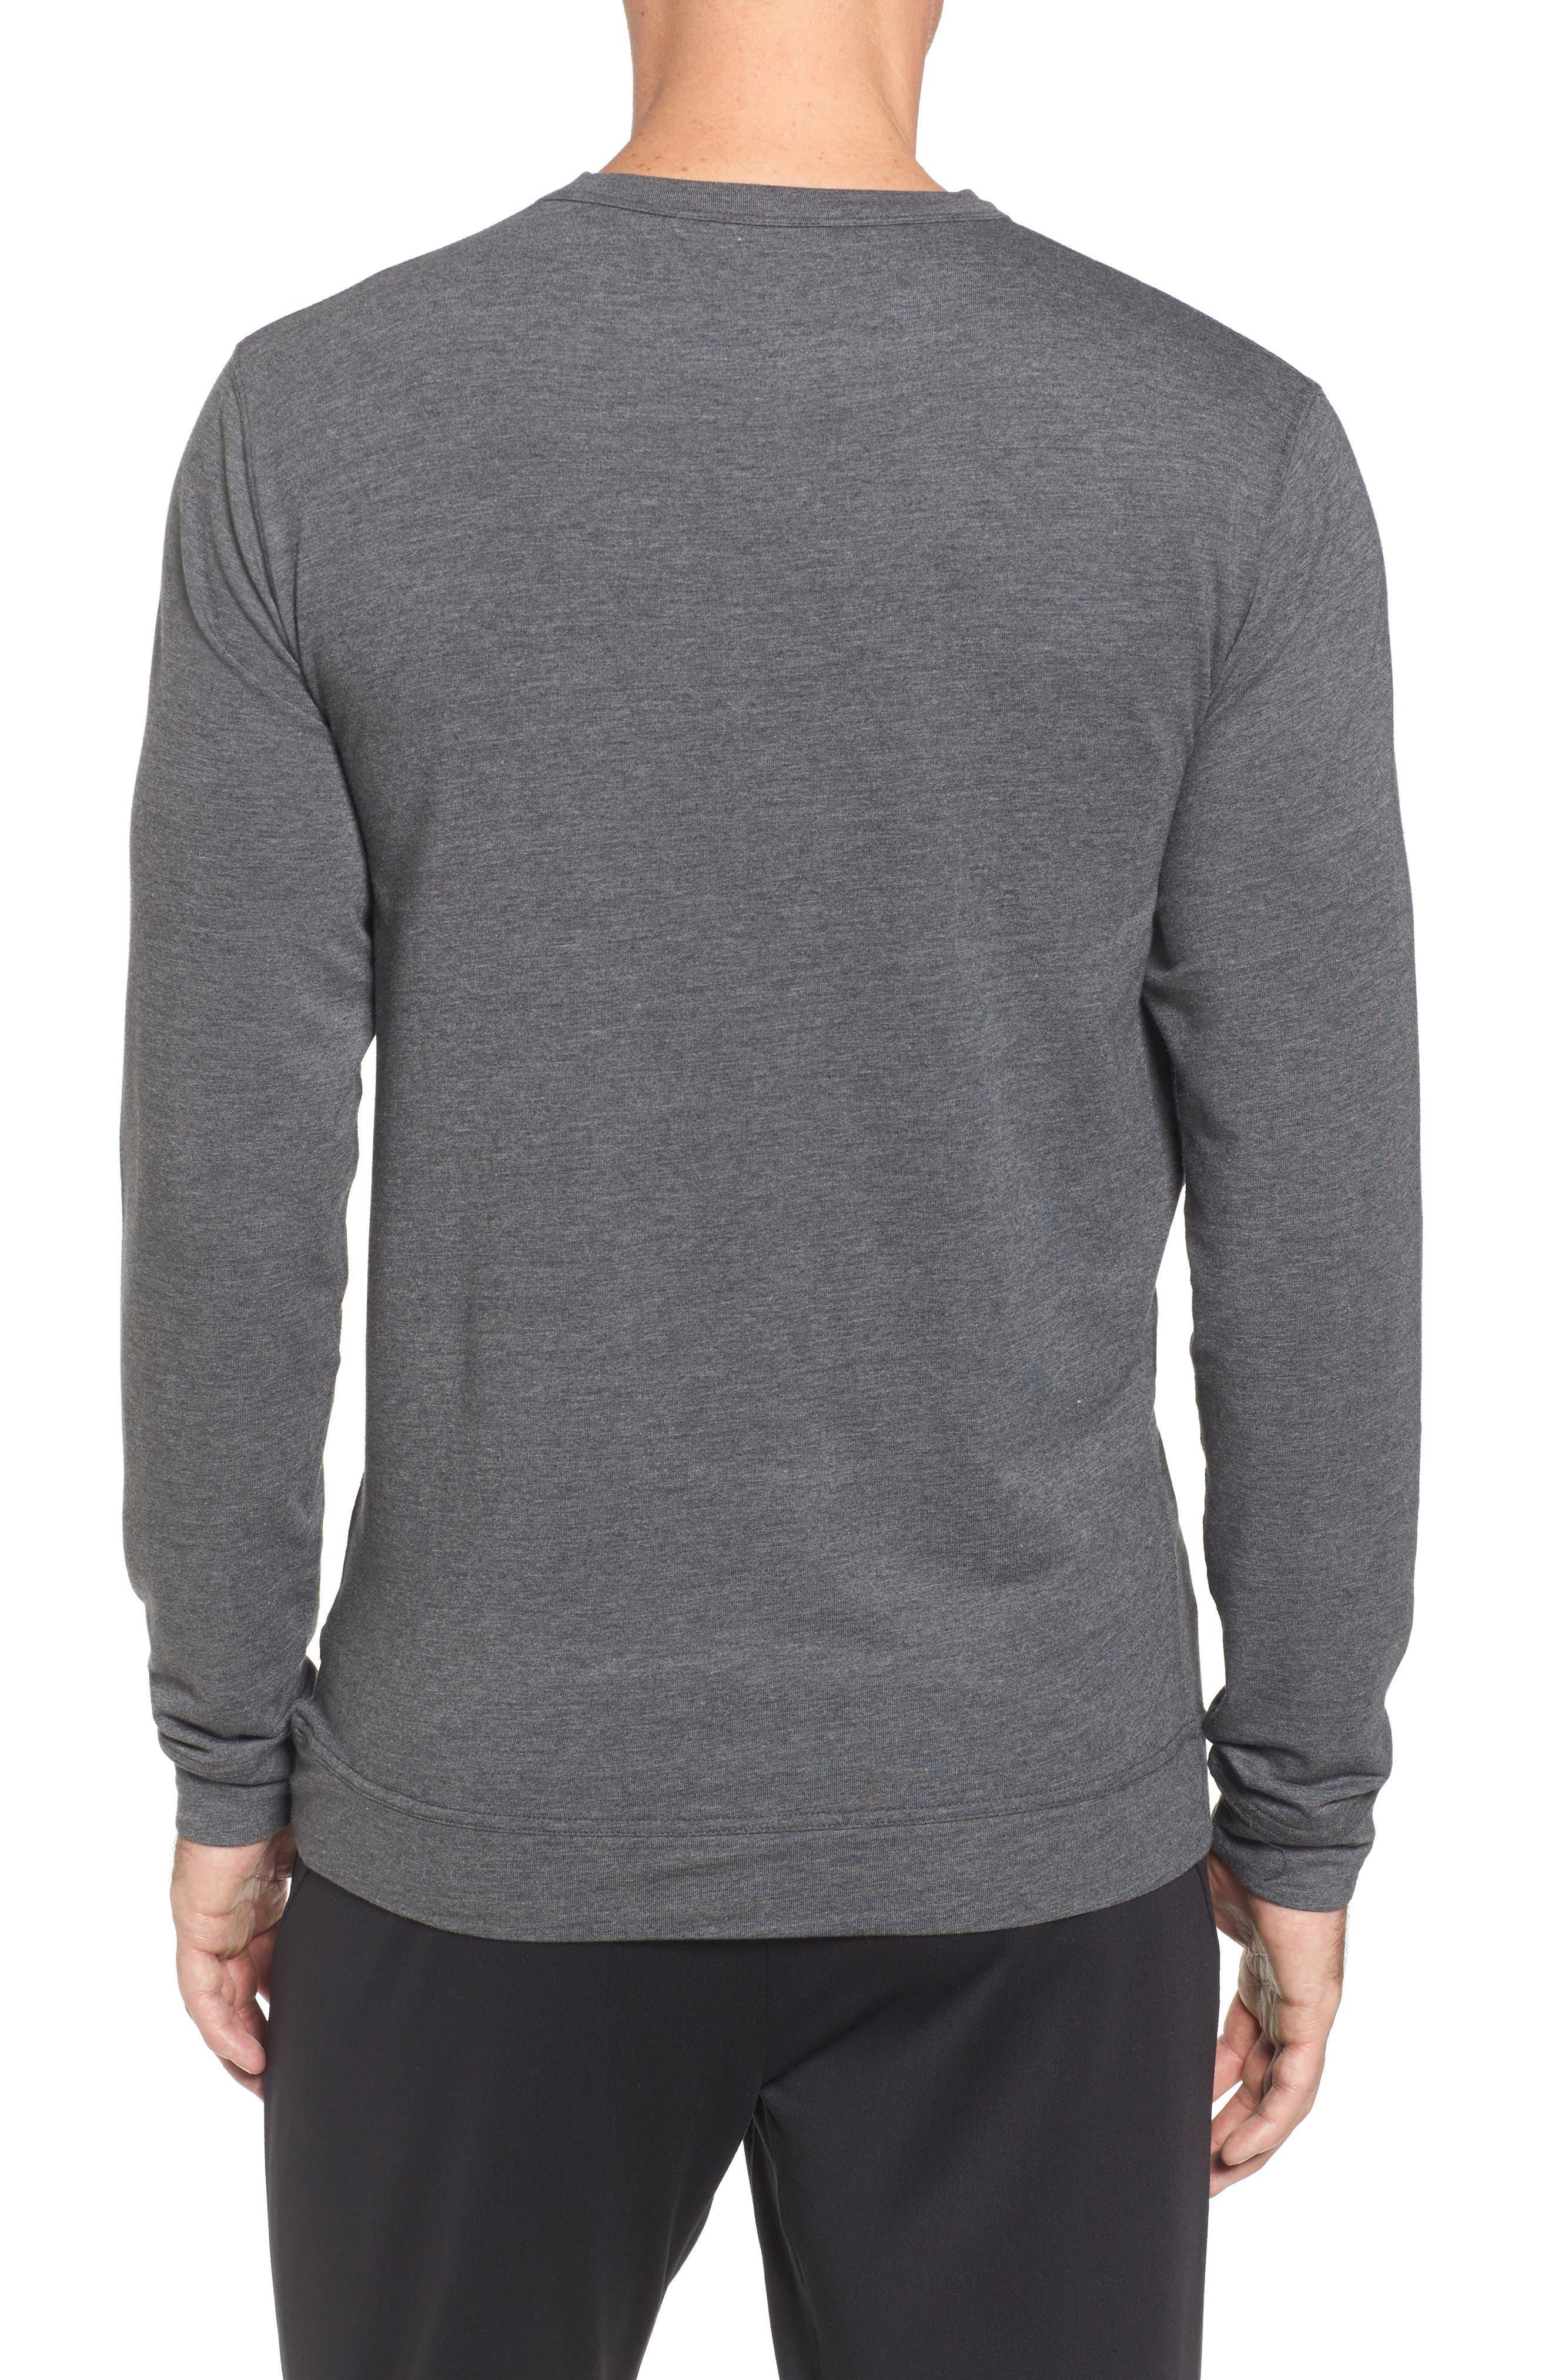 TASC PERFORMANCE, Legacy Crewneck Sweatshirt, Alternate thumbnail 2, color, BLACK HEATHER